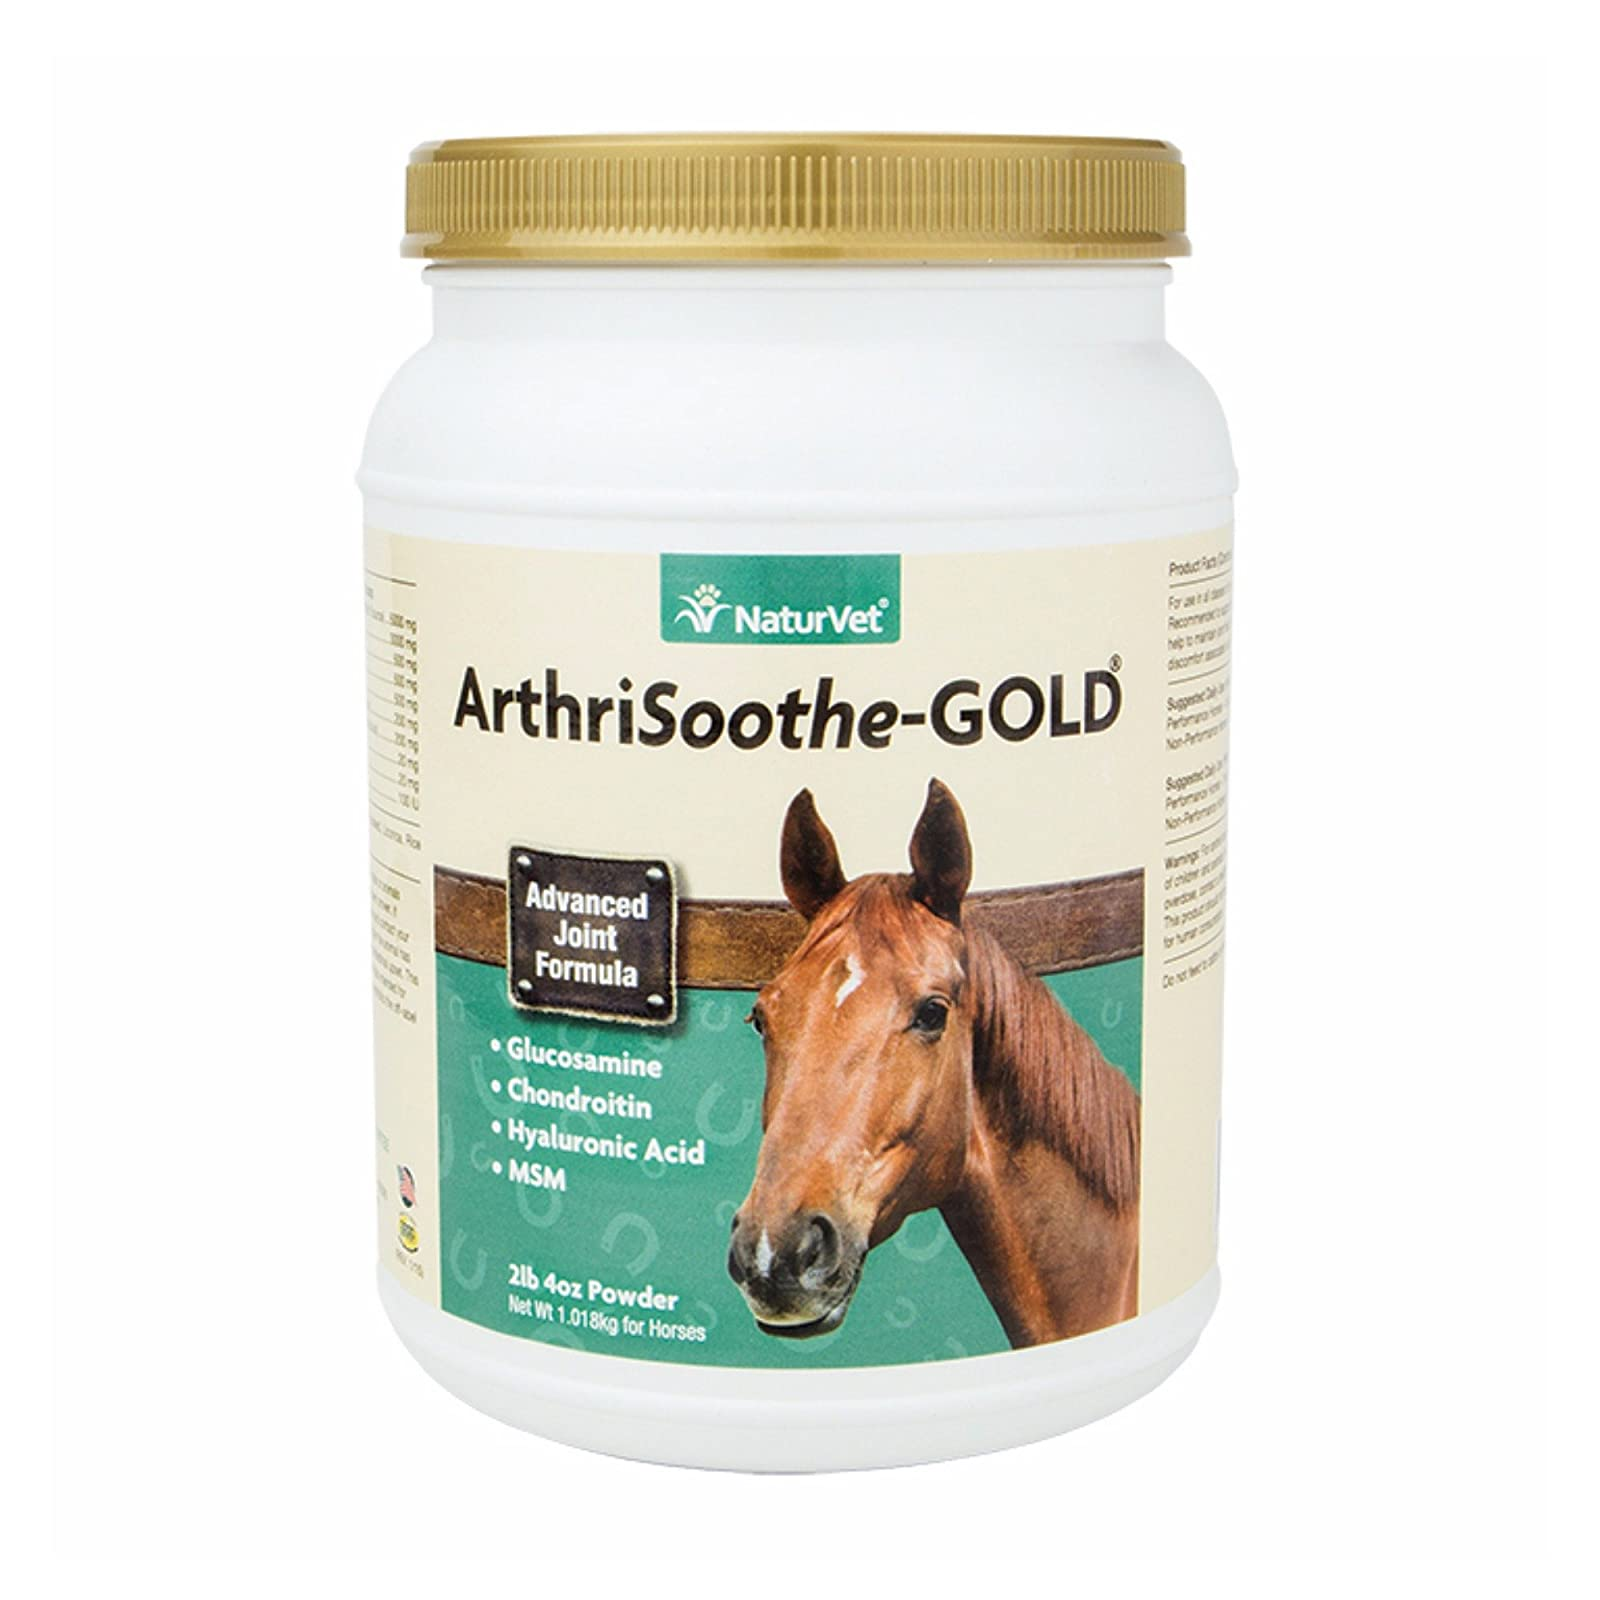 NaturVet ArthriSoothe-Gold Horse Powder 60 Day 79901006 - 1